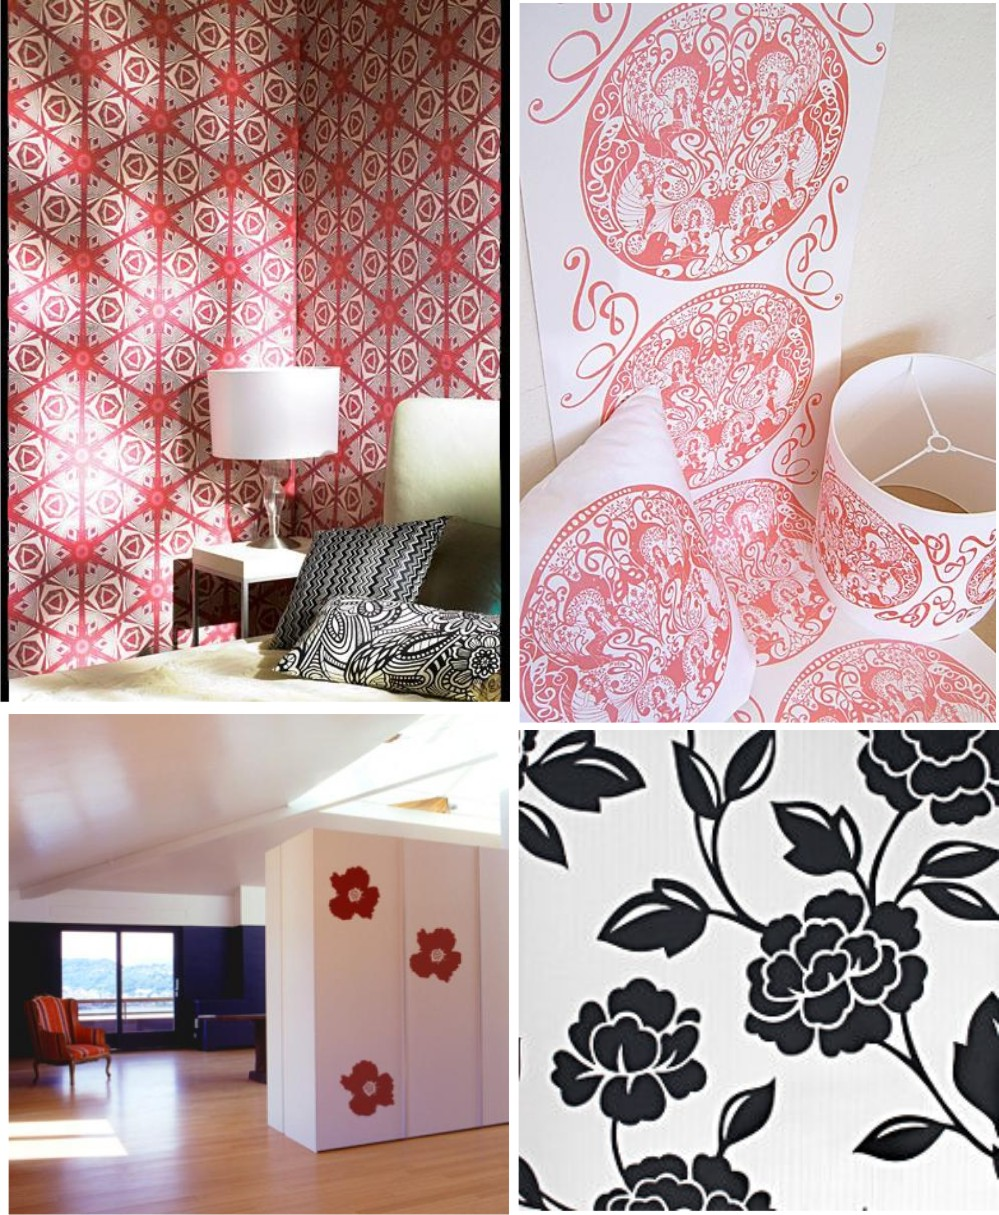 papel de parede decoracao de interiores:Decoracao Papel De Paredes